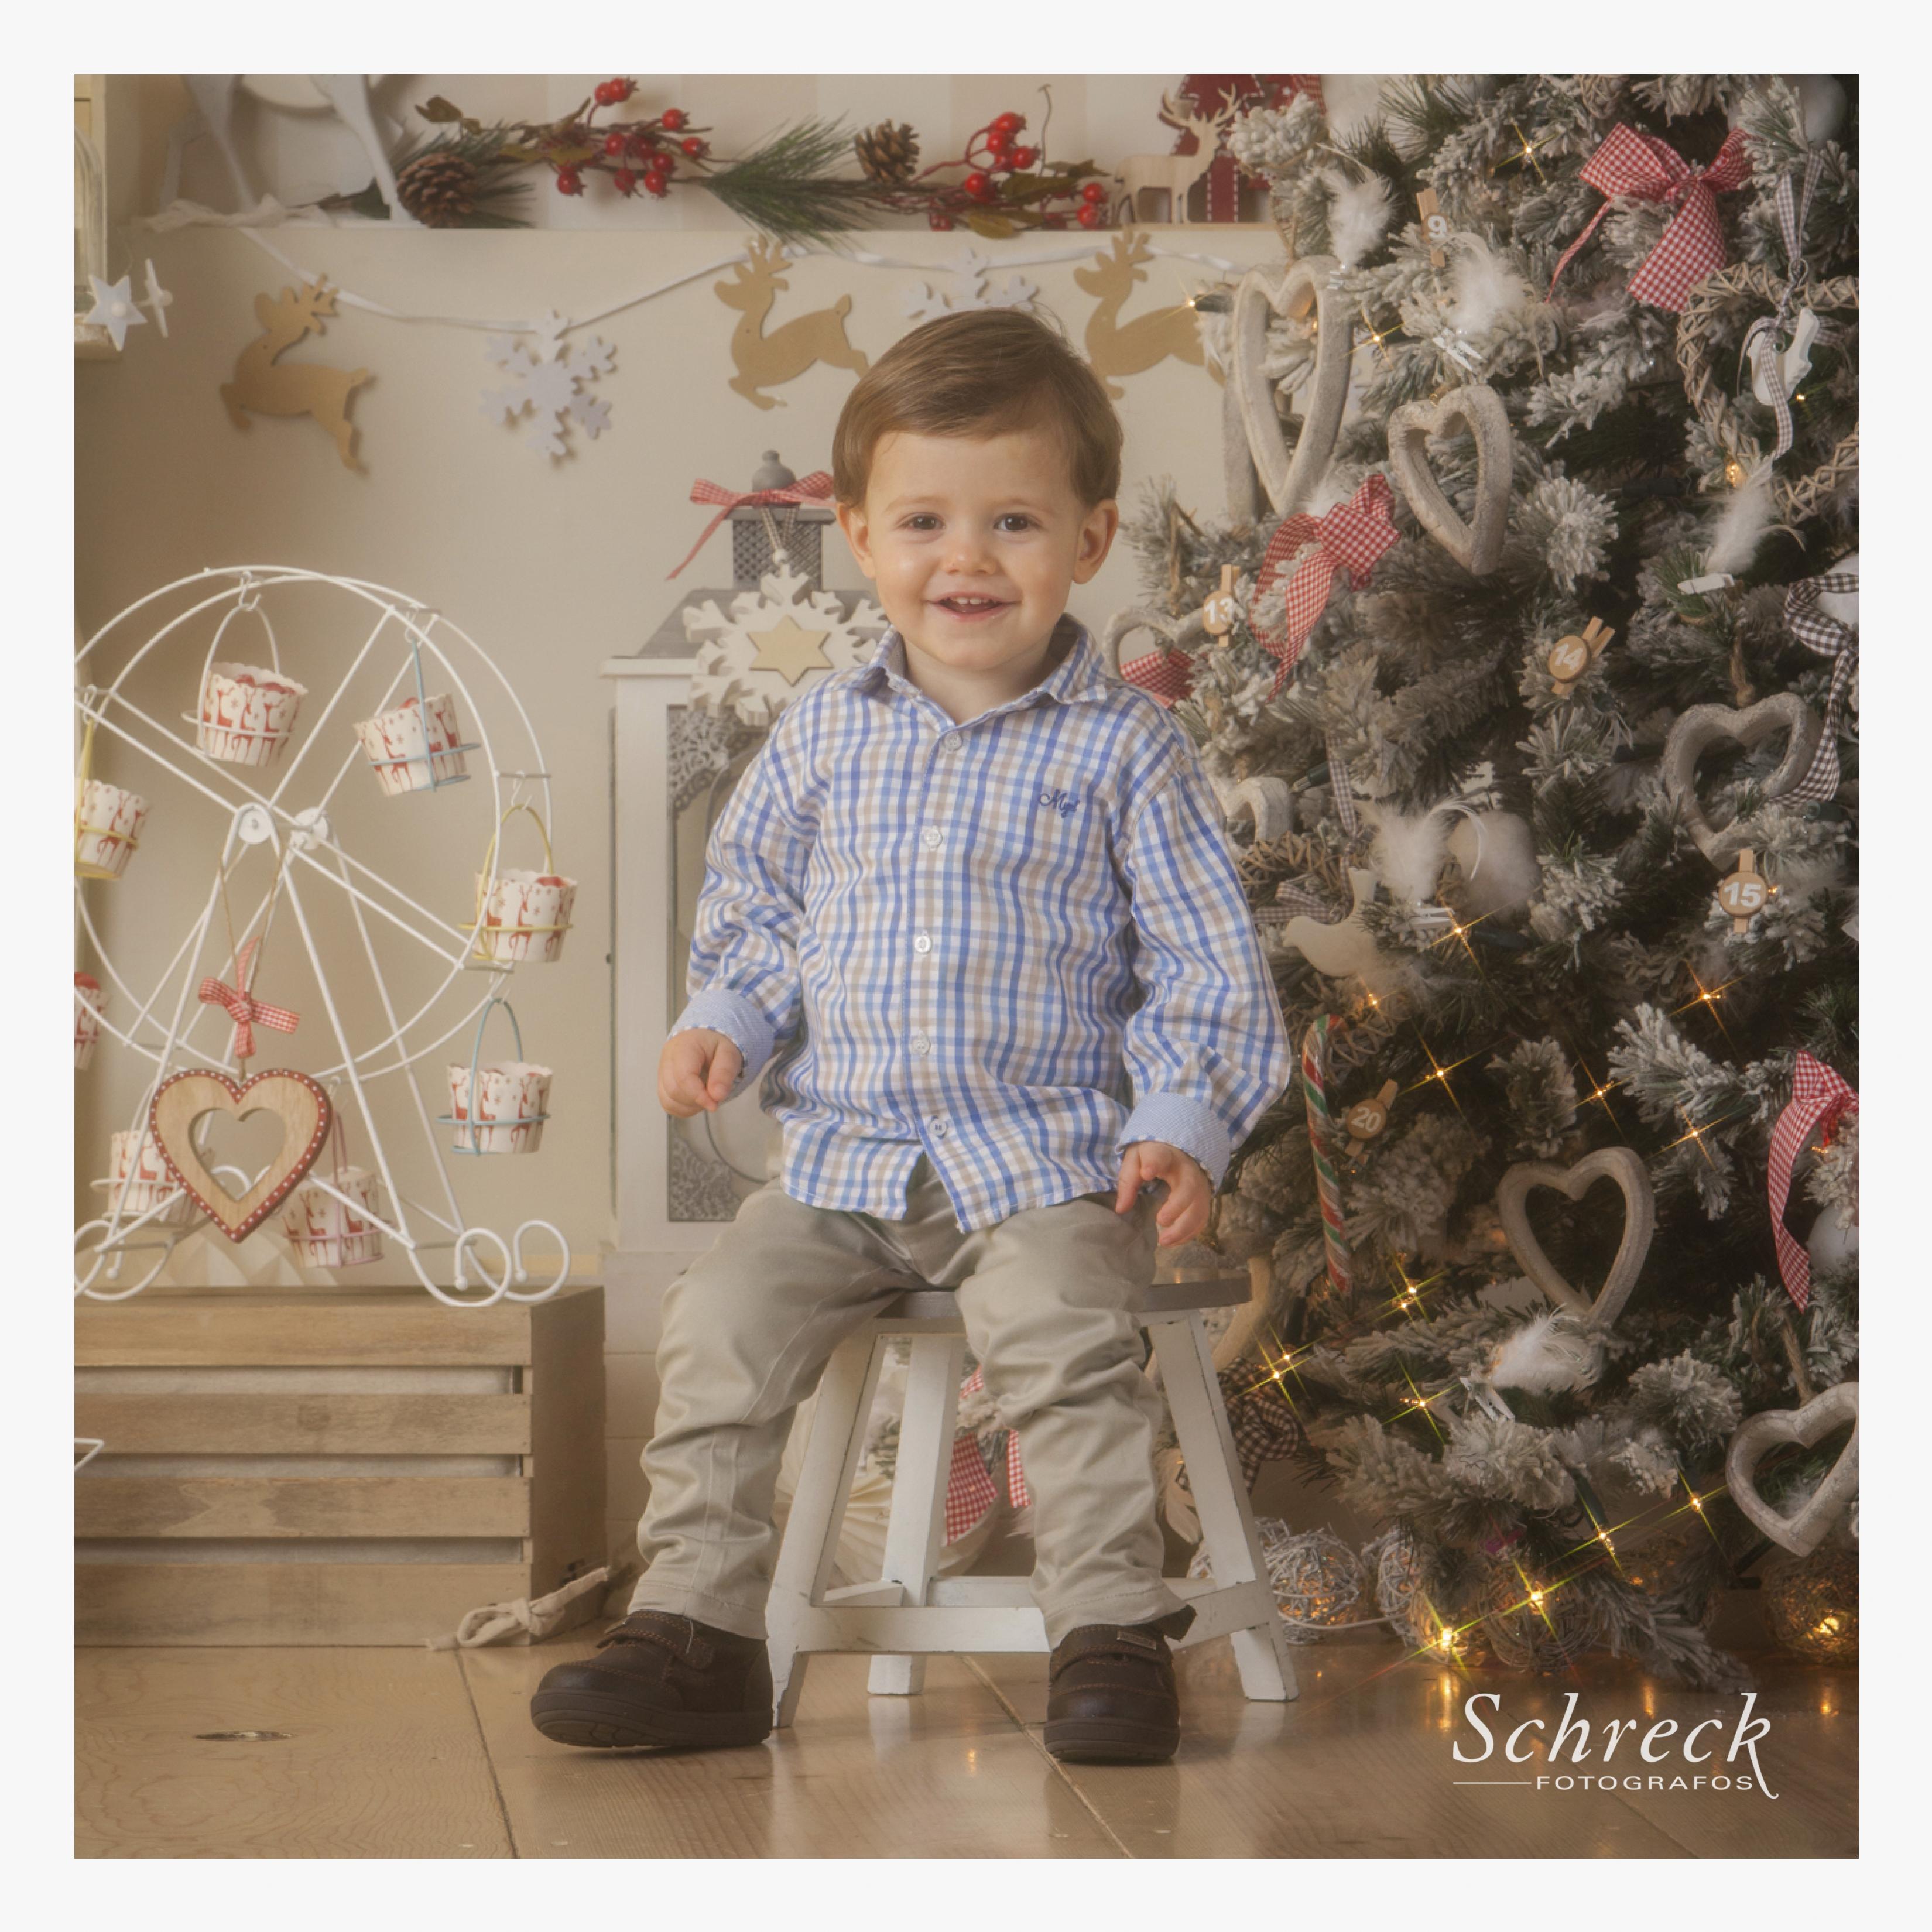 Schreck Christmas_6